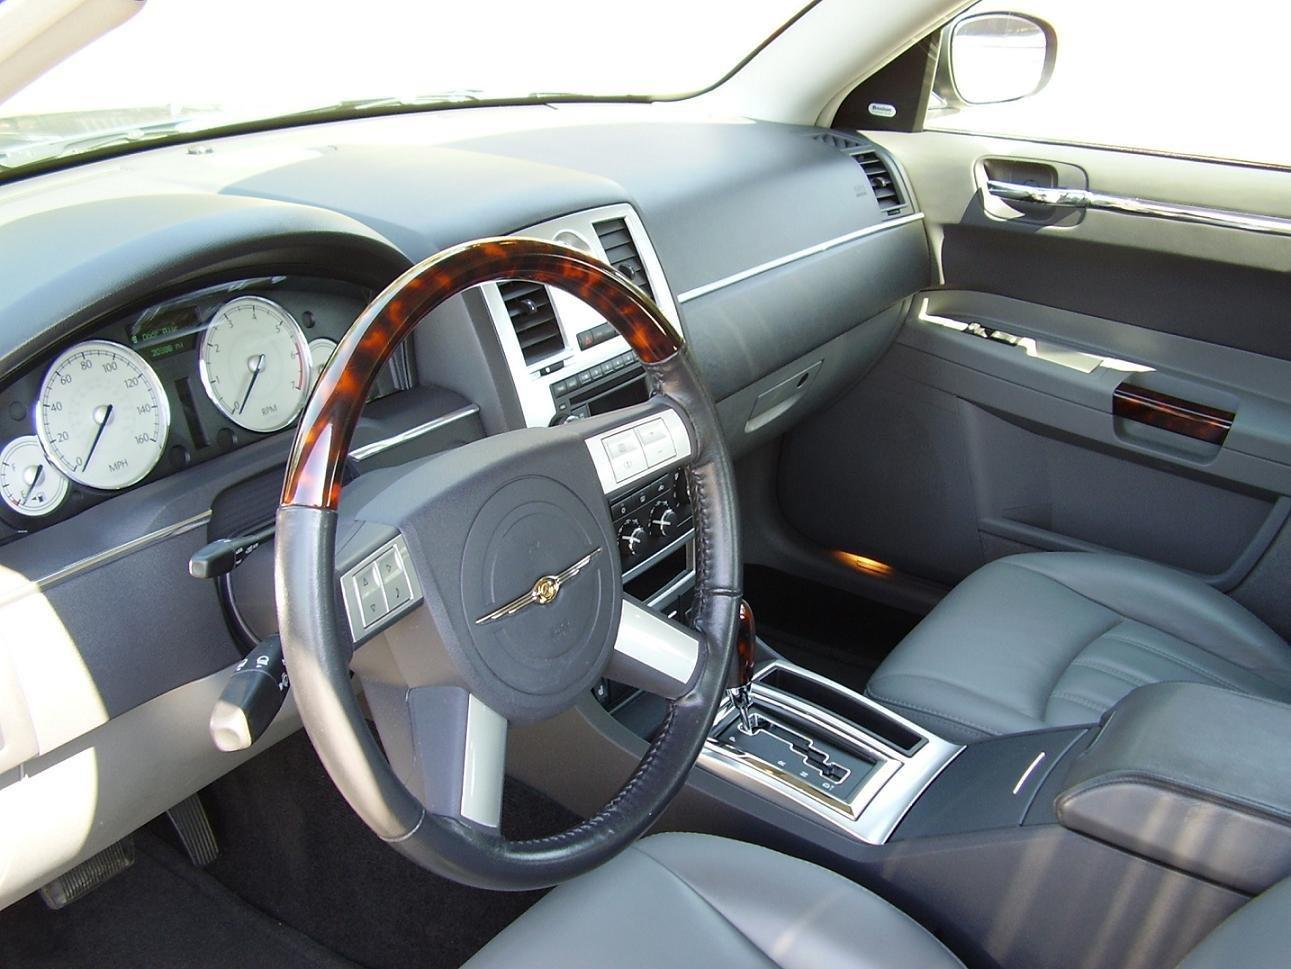 Here it is 2008 300c interior photo page 3 chrysler 300c forum 300c srt8 forums